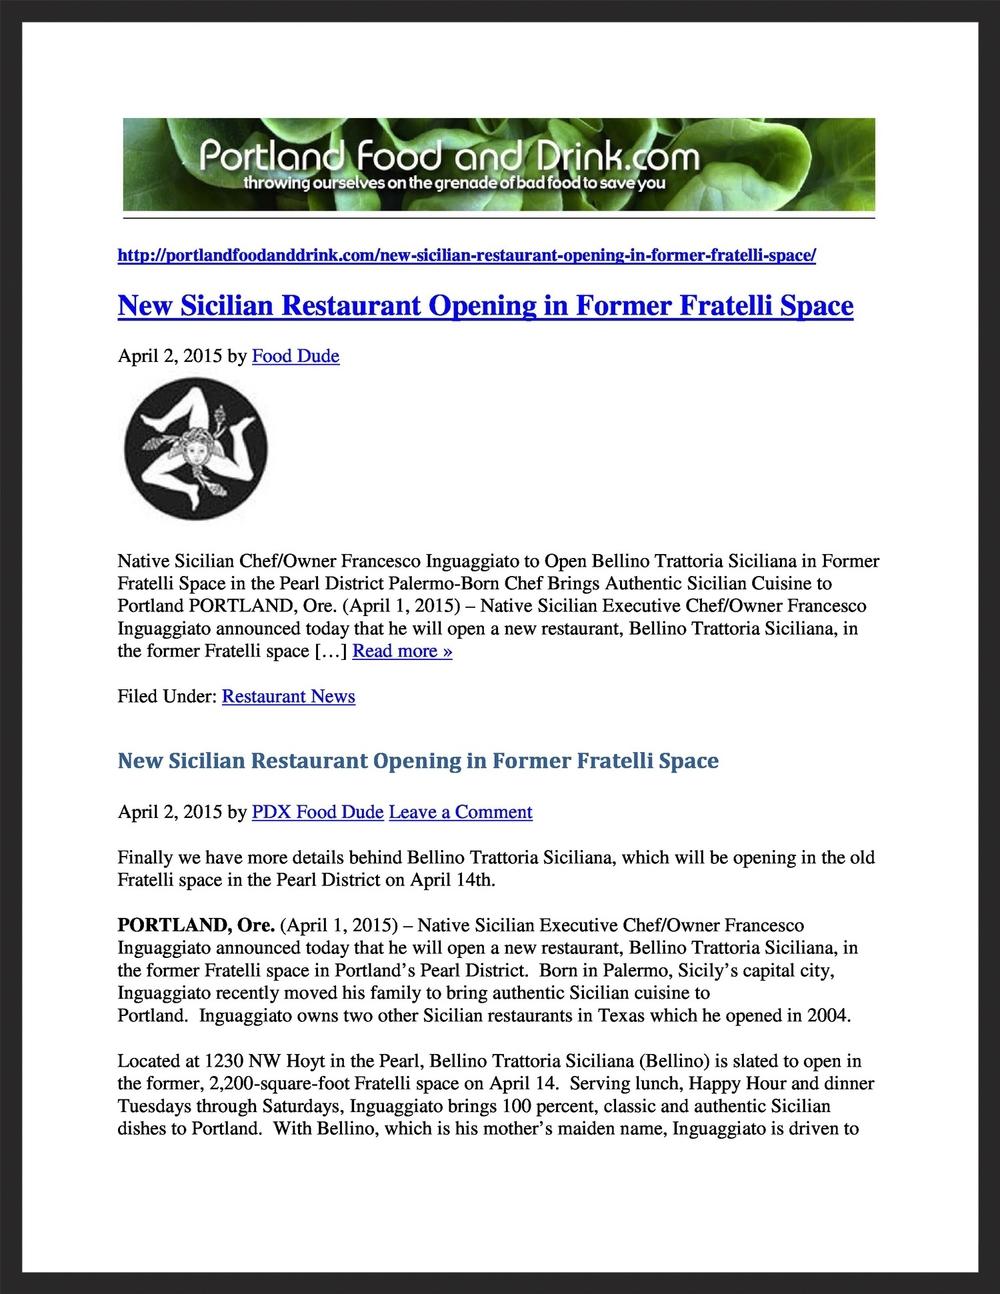 BELLINO TRATTORIA SICILIANA   PortlandFoodandDrink.com  04.02.2015